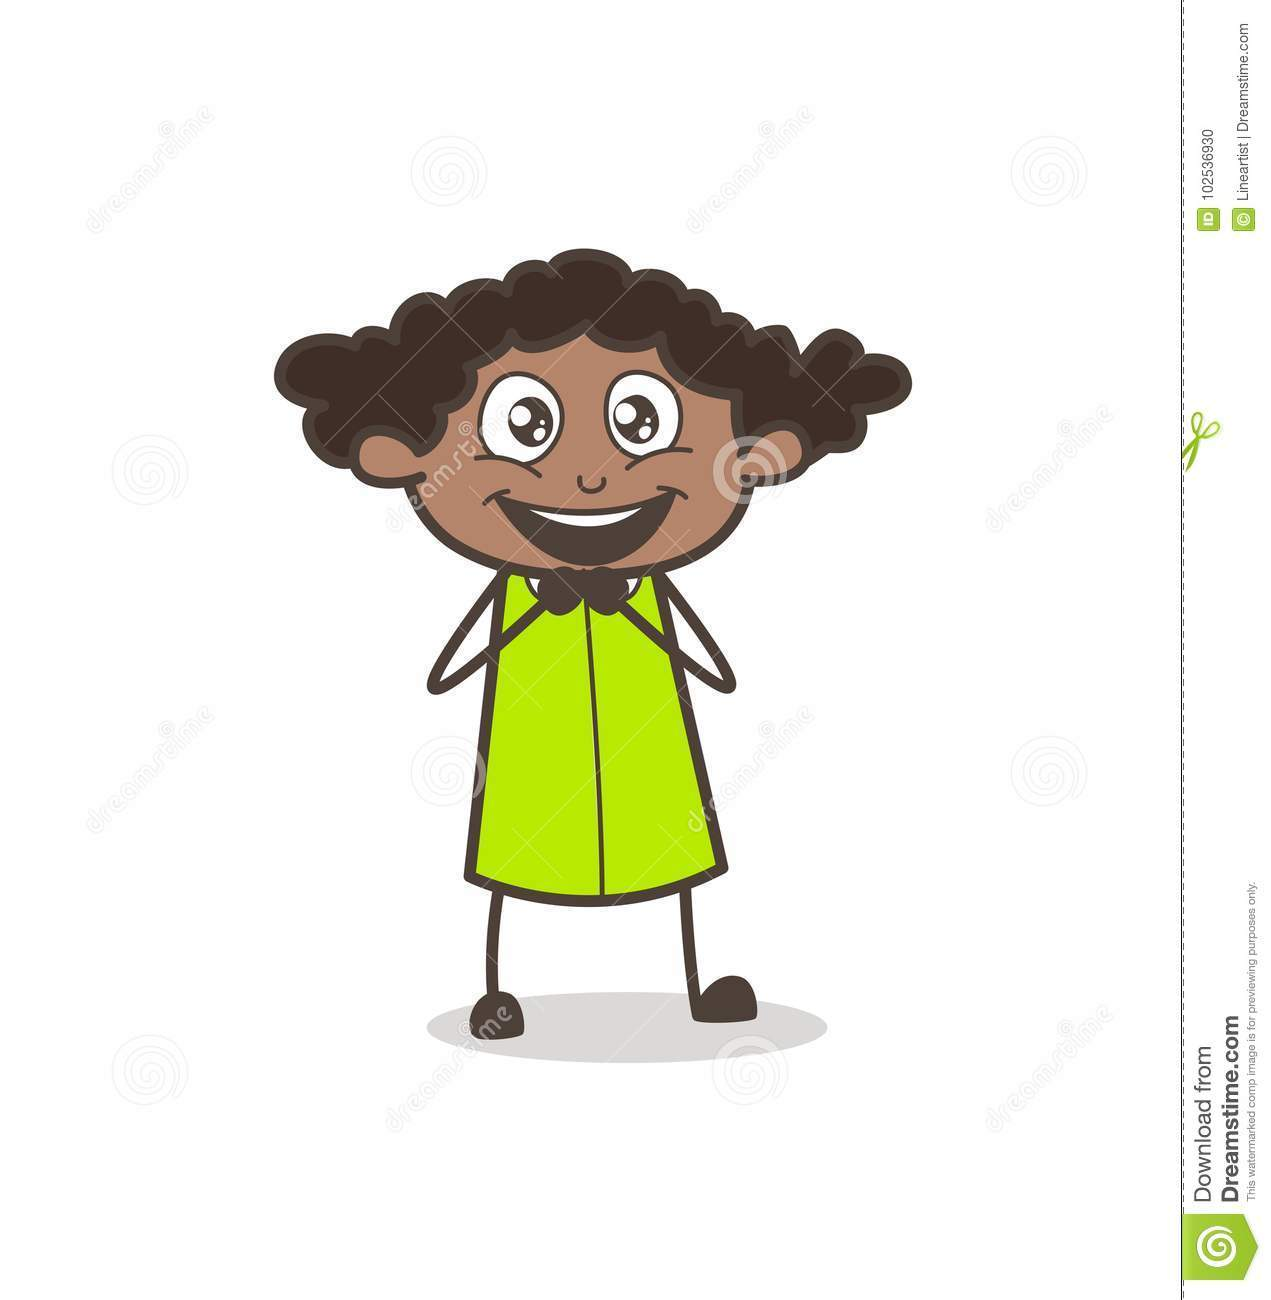 Innocent girl clipart graphic stock Innocent girl clipart 6 » Clipart Portal graphic stock